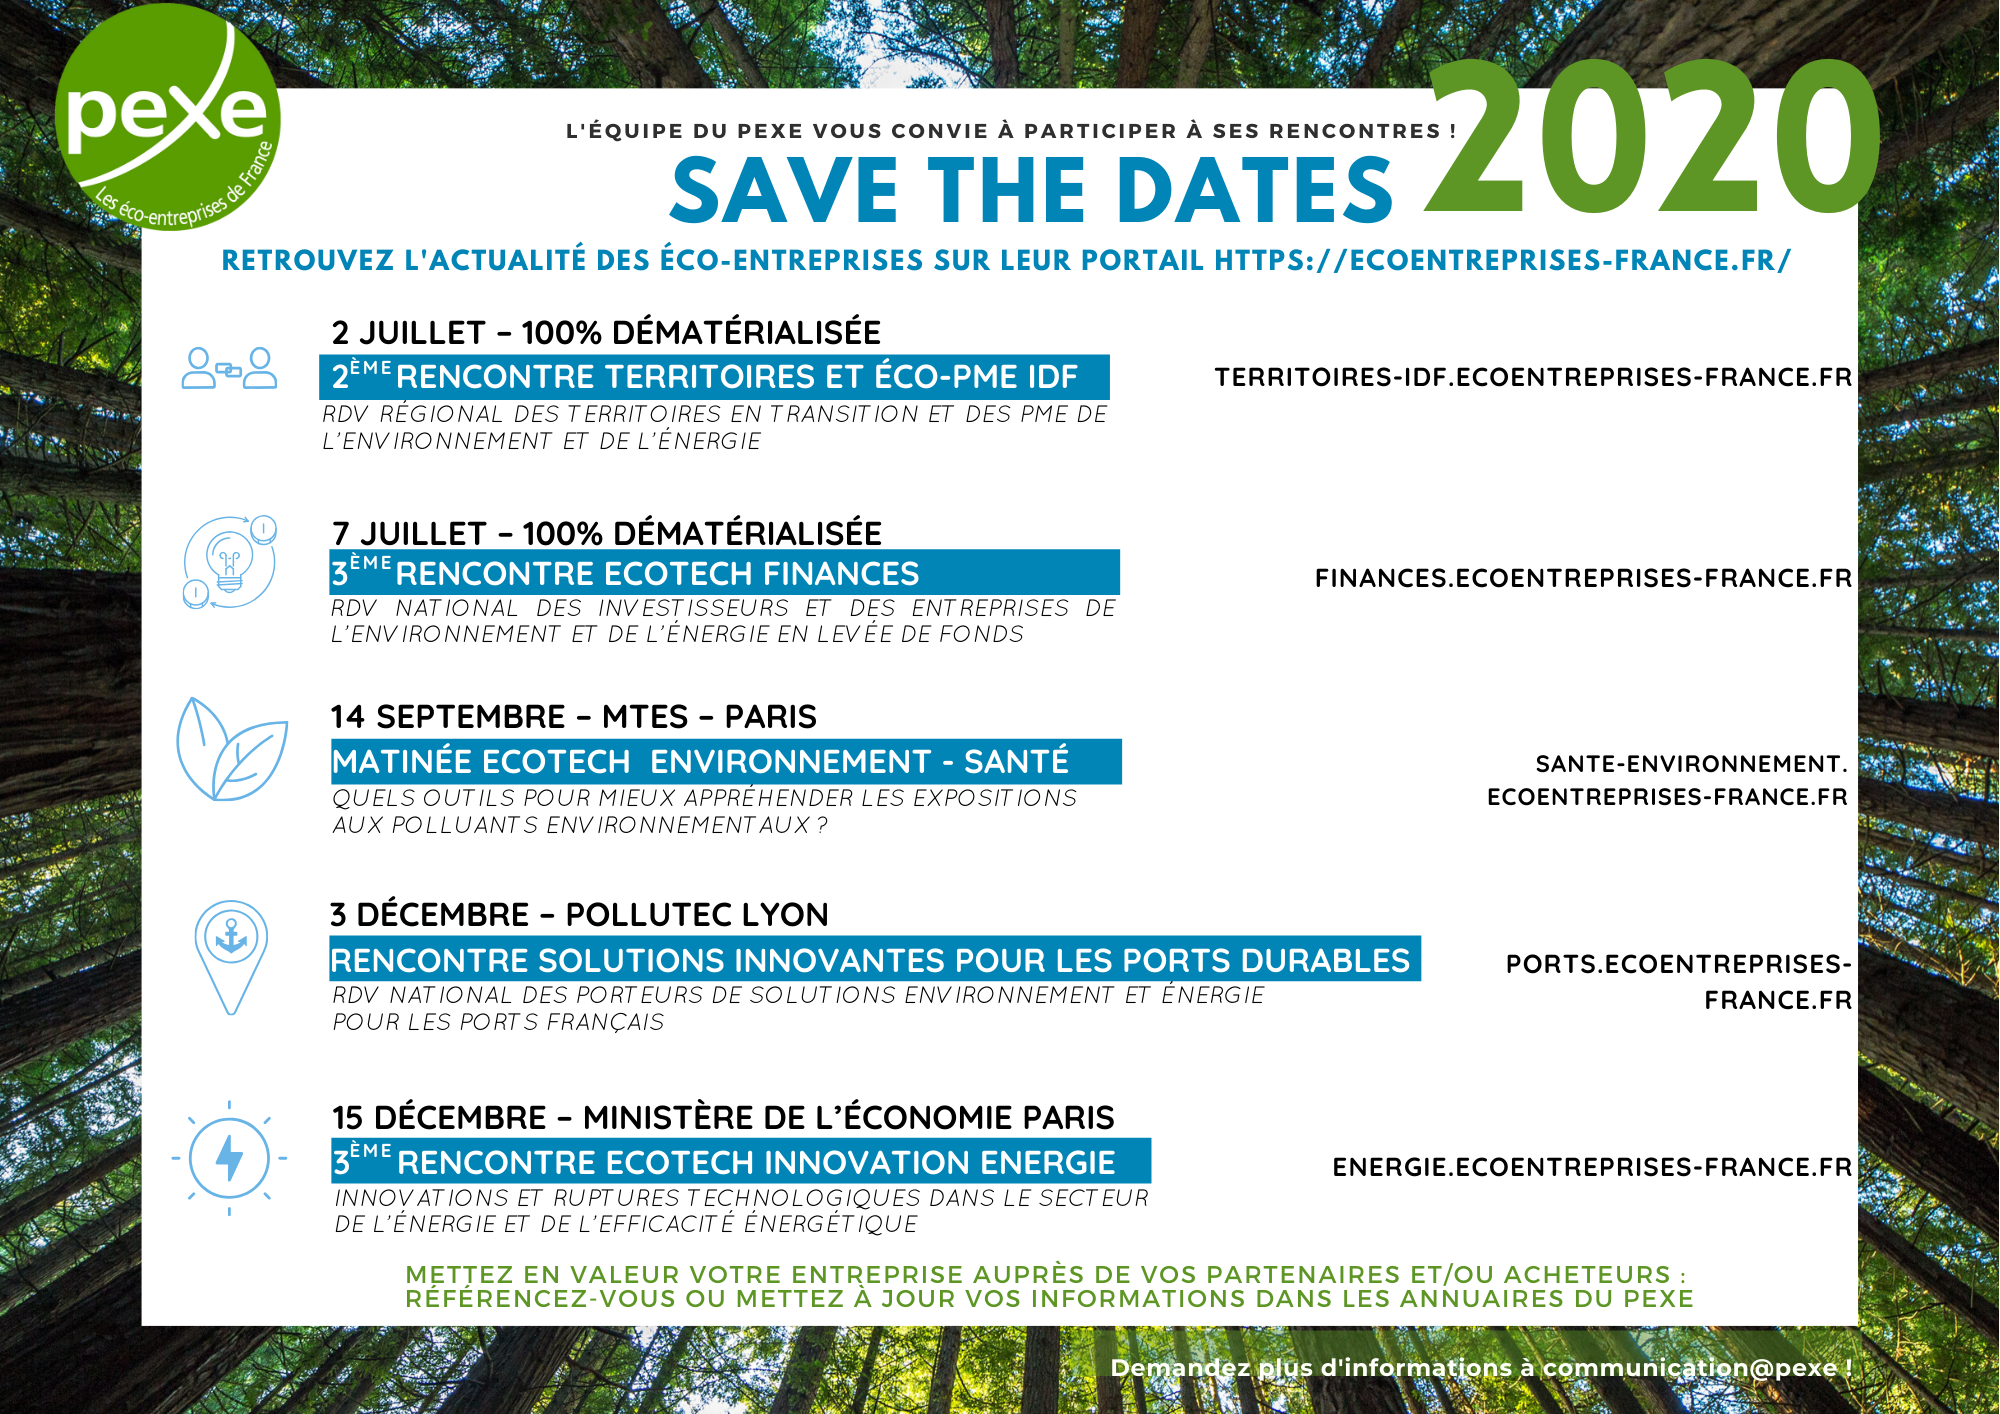 https://ecoentreprises-france.fr/?utm_source=sendinblue&utm_campaign=Newsletter_de_mai_du_rseau_PEXE_les_coentreprises_de_France__actions_du_rseau_en_priode_de_COVID19&utm_medium=email